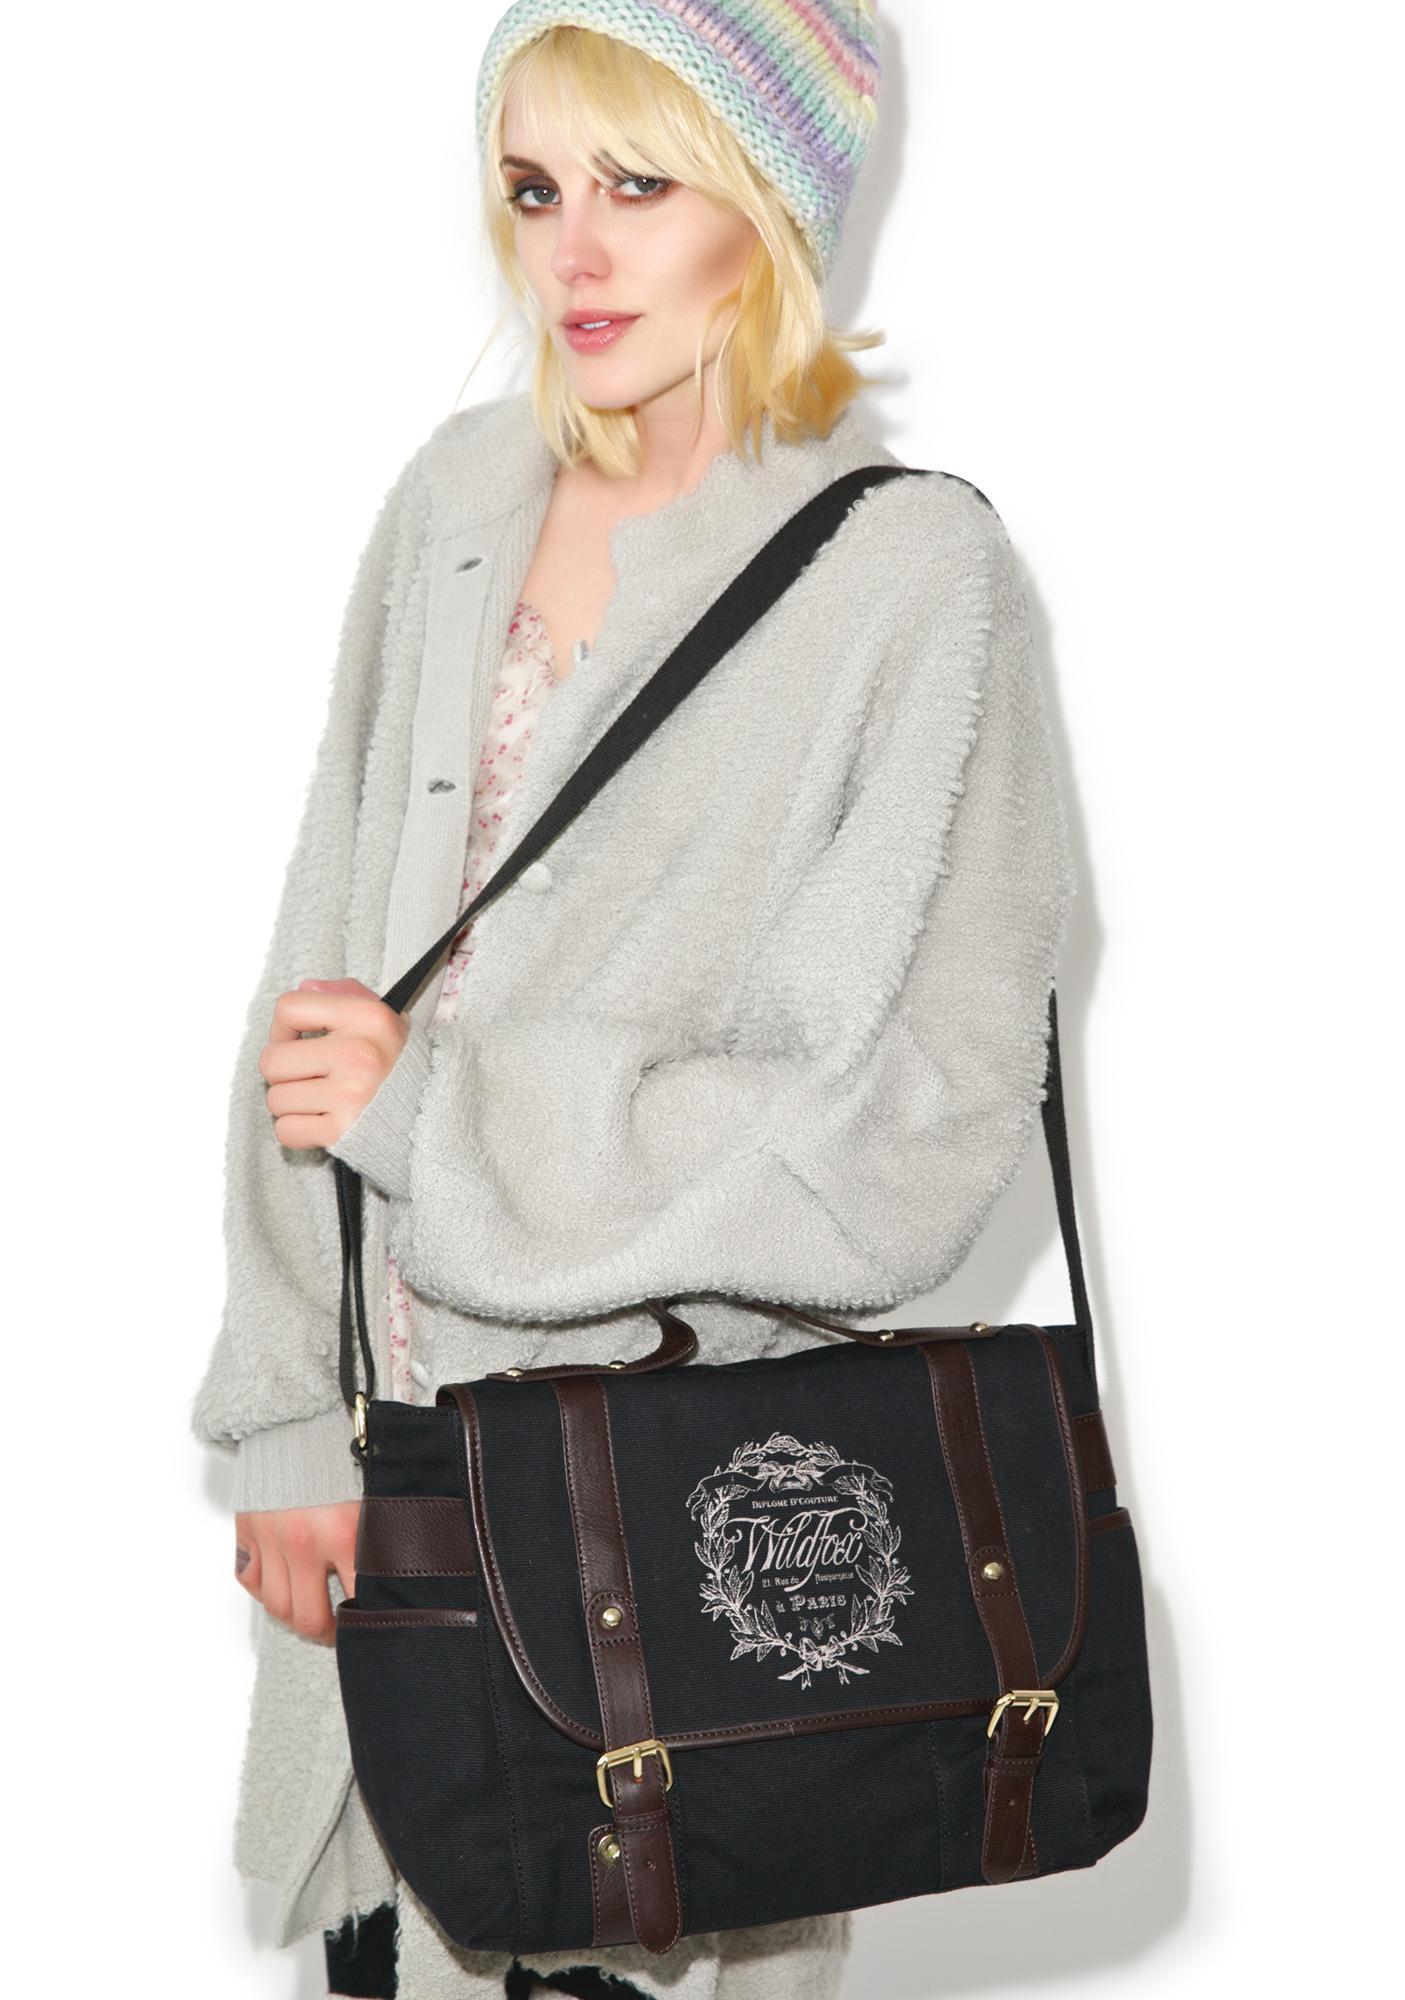 Wildfox Couture Paris Country Crest Messenger Bag